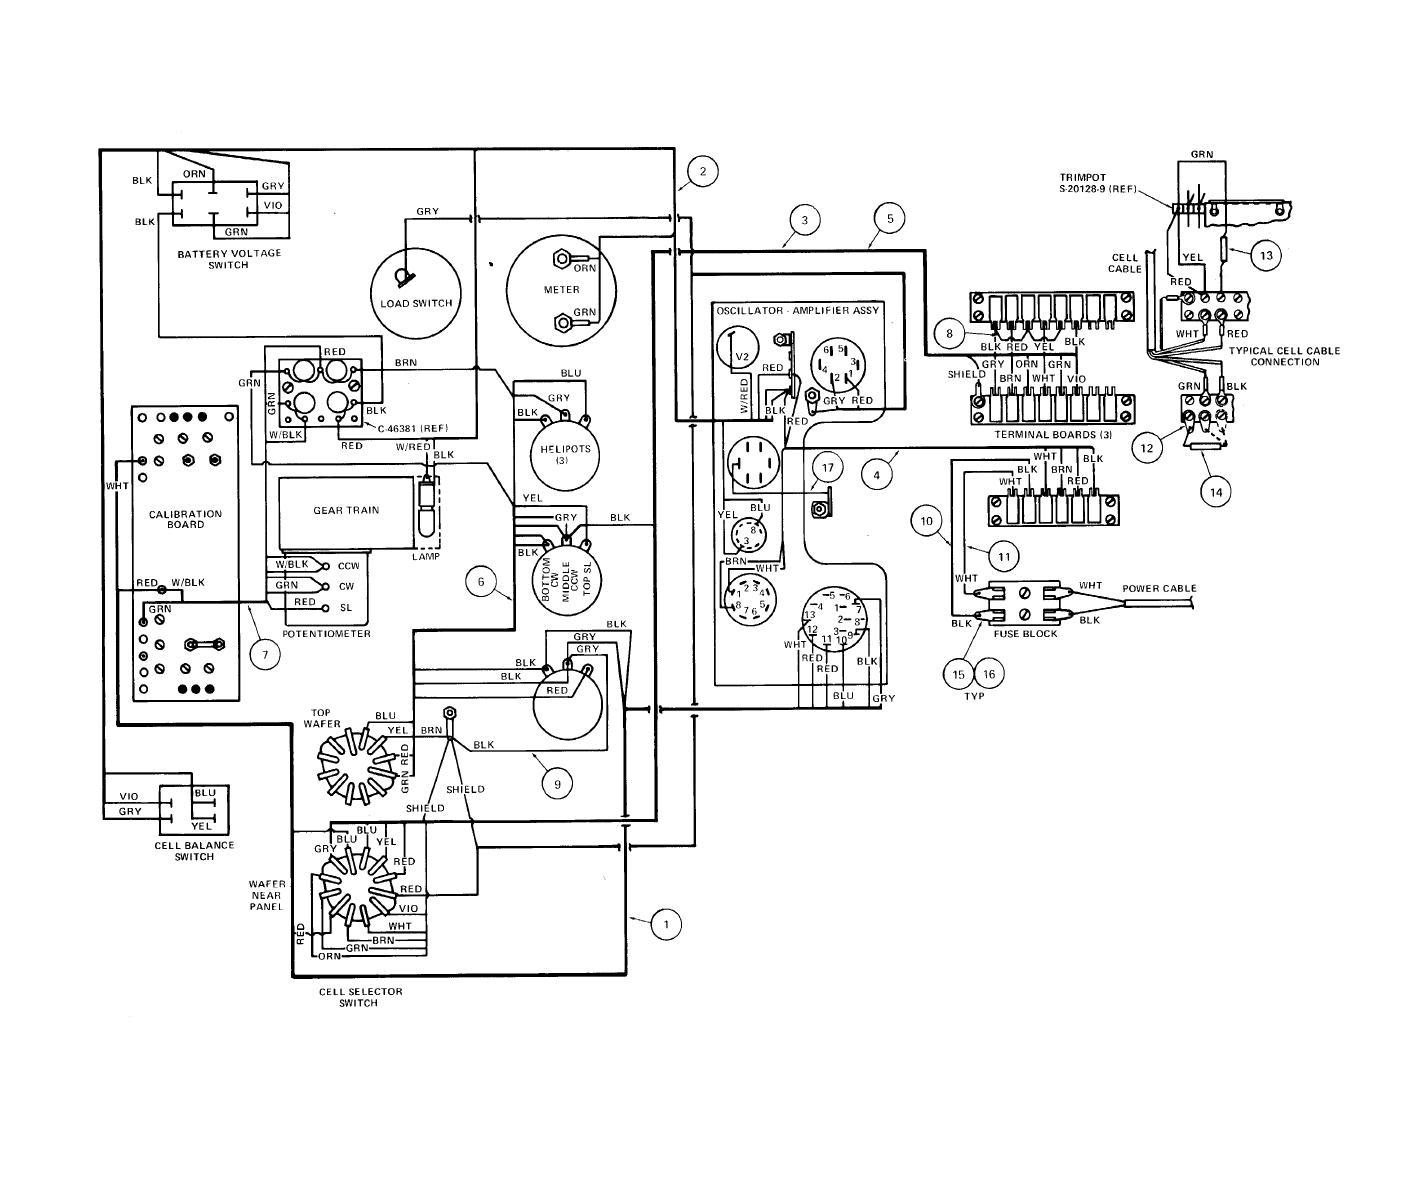 reading aircraft wiring diagrams delco radio diagram manual get free image